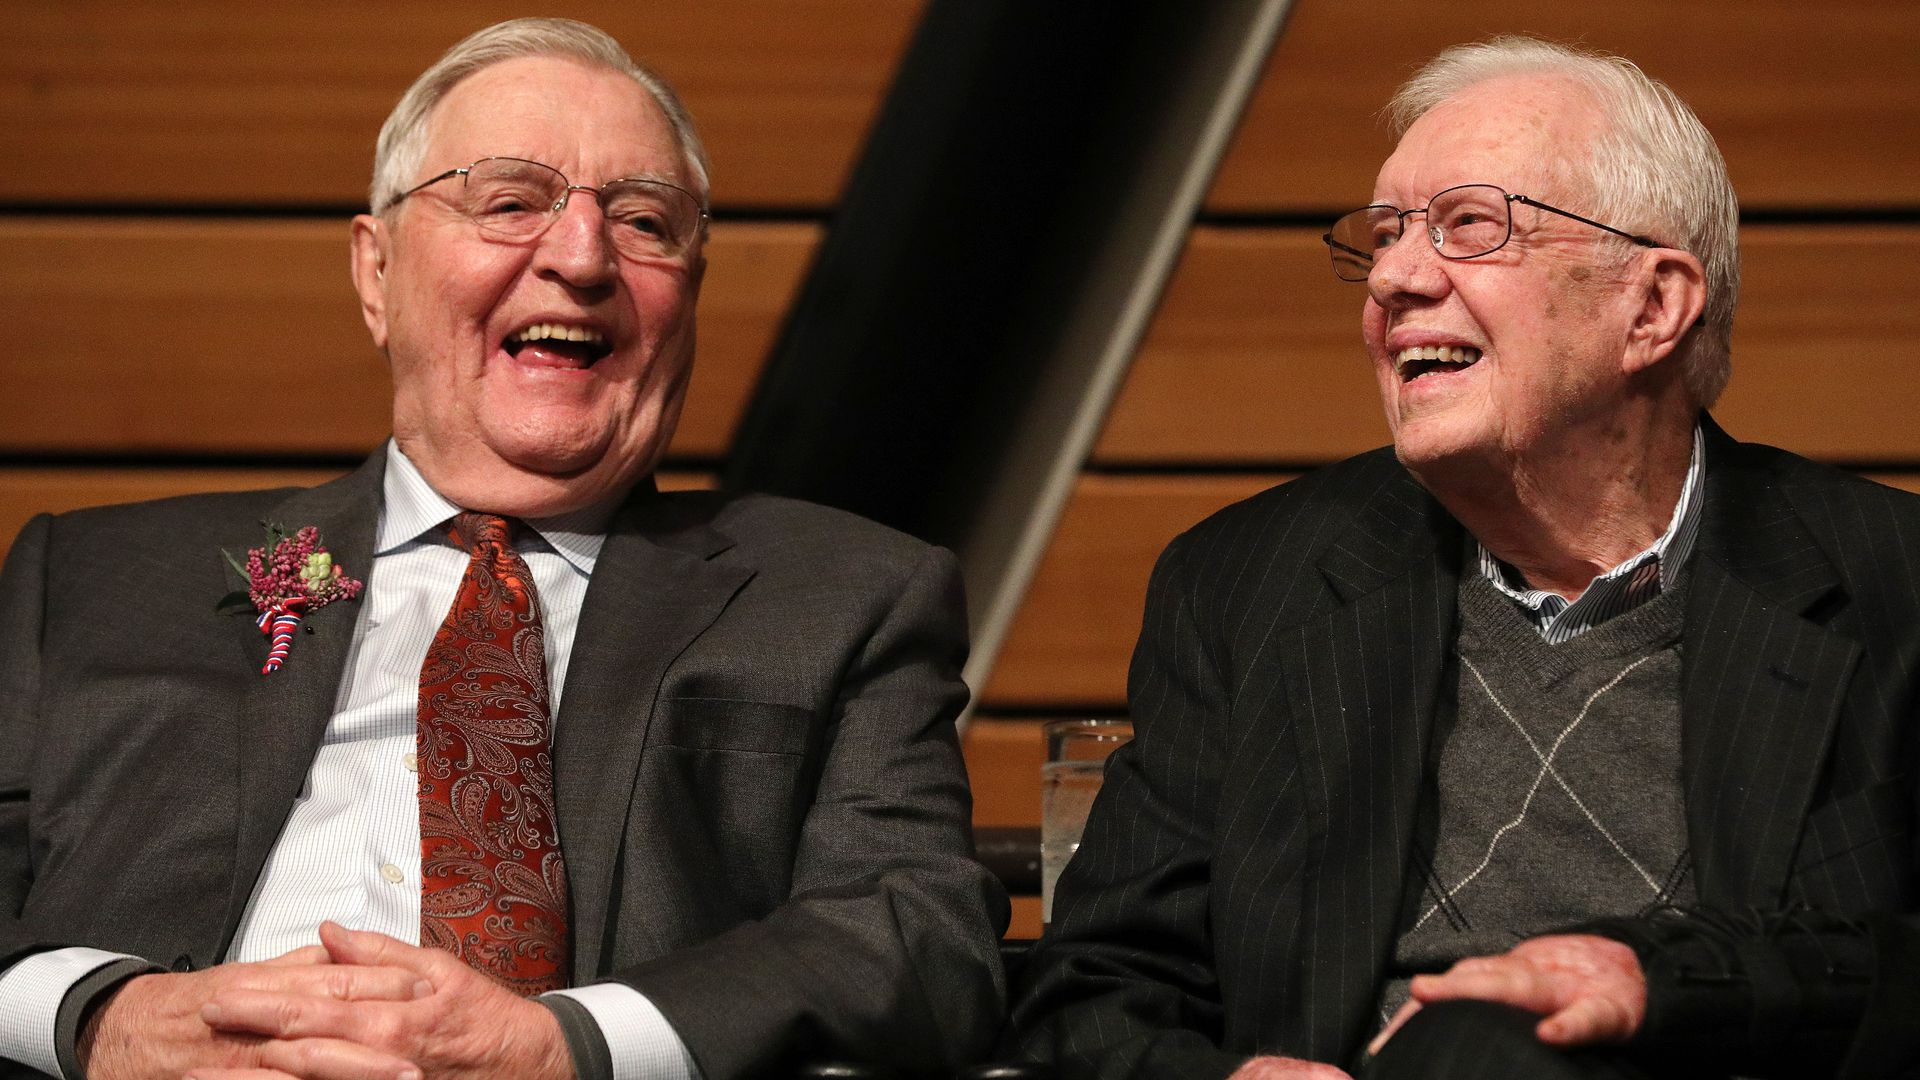 Walter Mondale Passes Away at 93